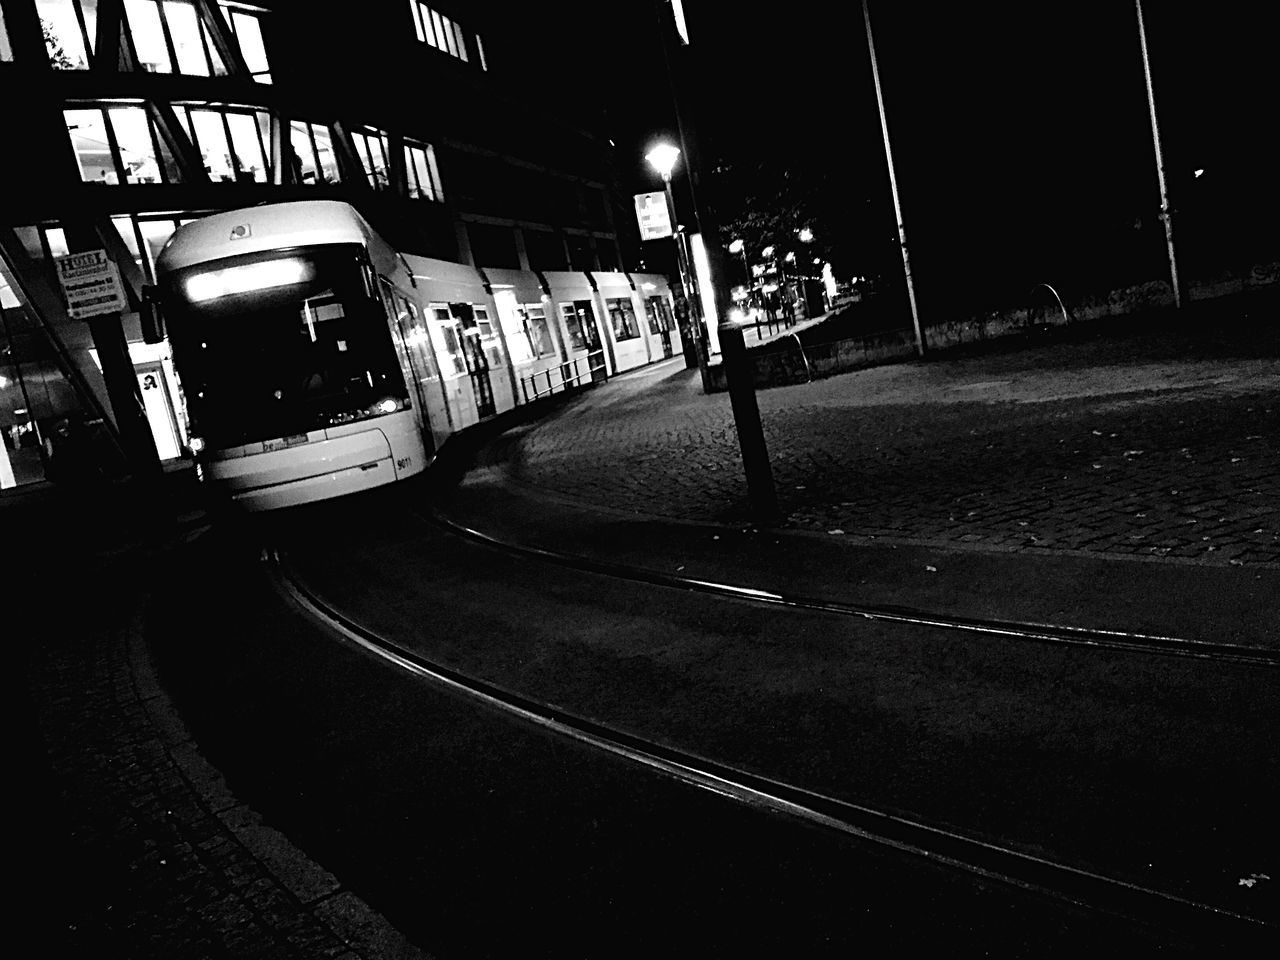 transportation, night, illuminated, public transportation, mode of transport, built structure, building exterior, architecture, railroad track, rail transportation, road, outdoors, land vehicle, city, no people